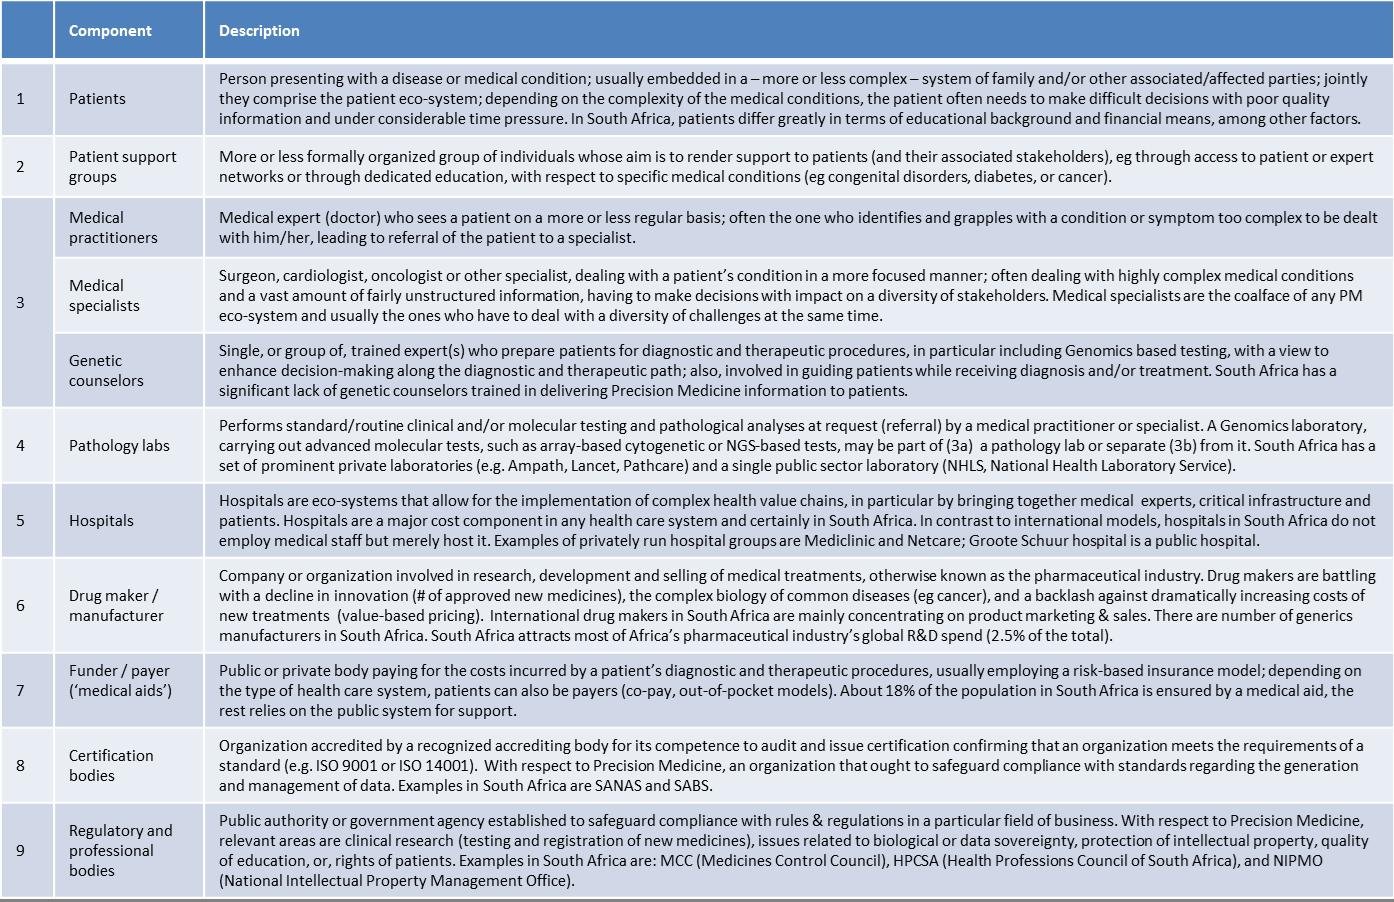 Precision Medicine components